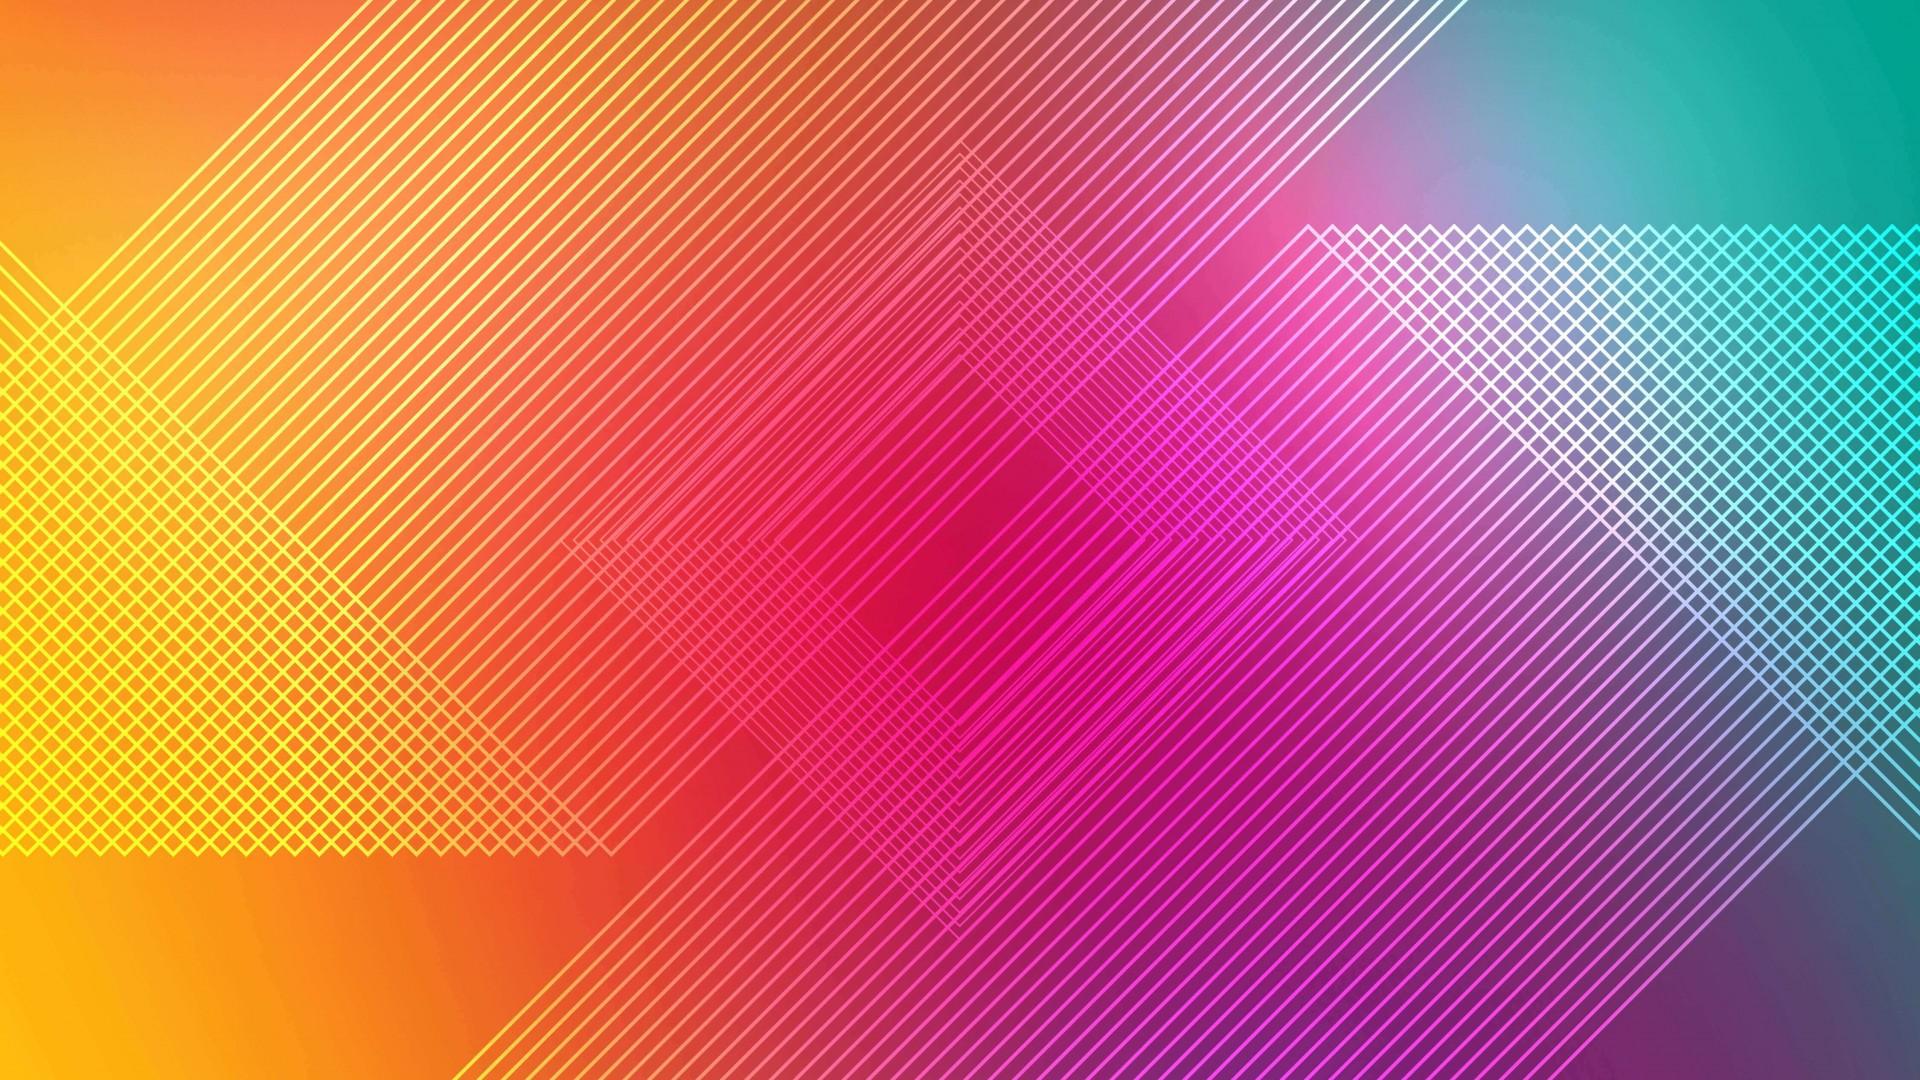 Kumpulan Wallpaper Keren Warna Pink HD Paling Baru